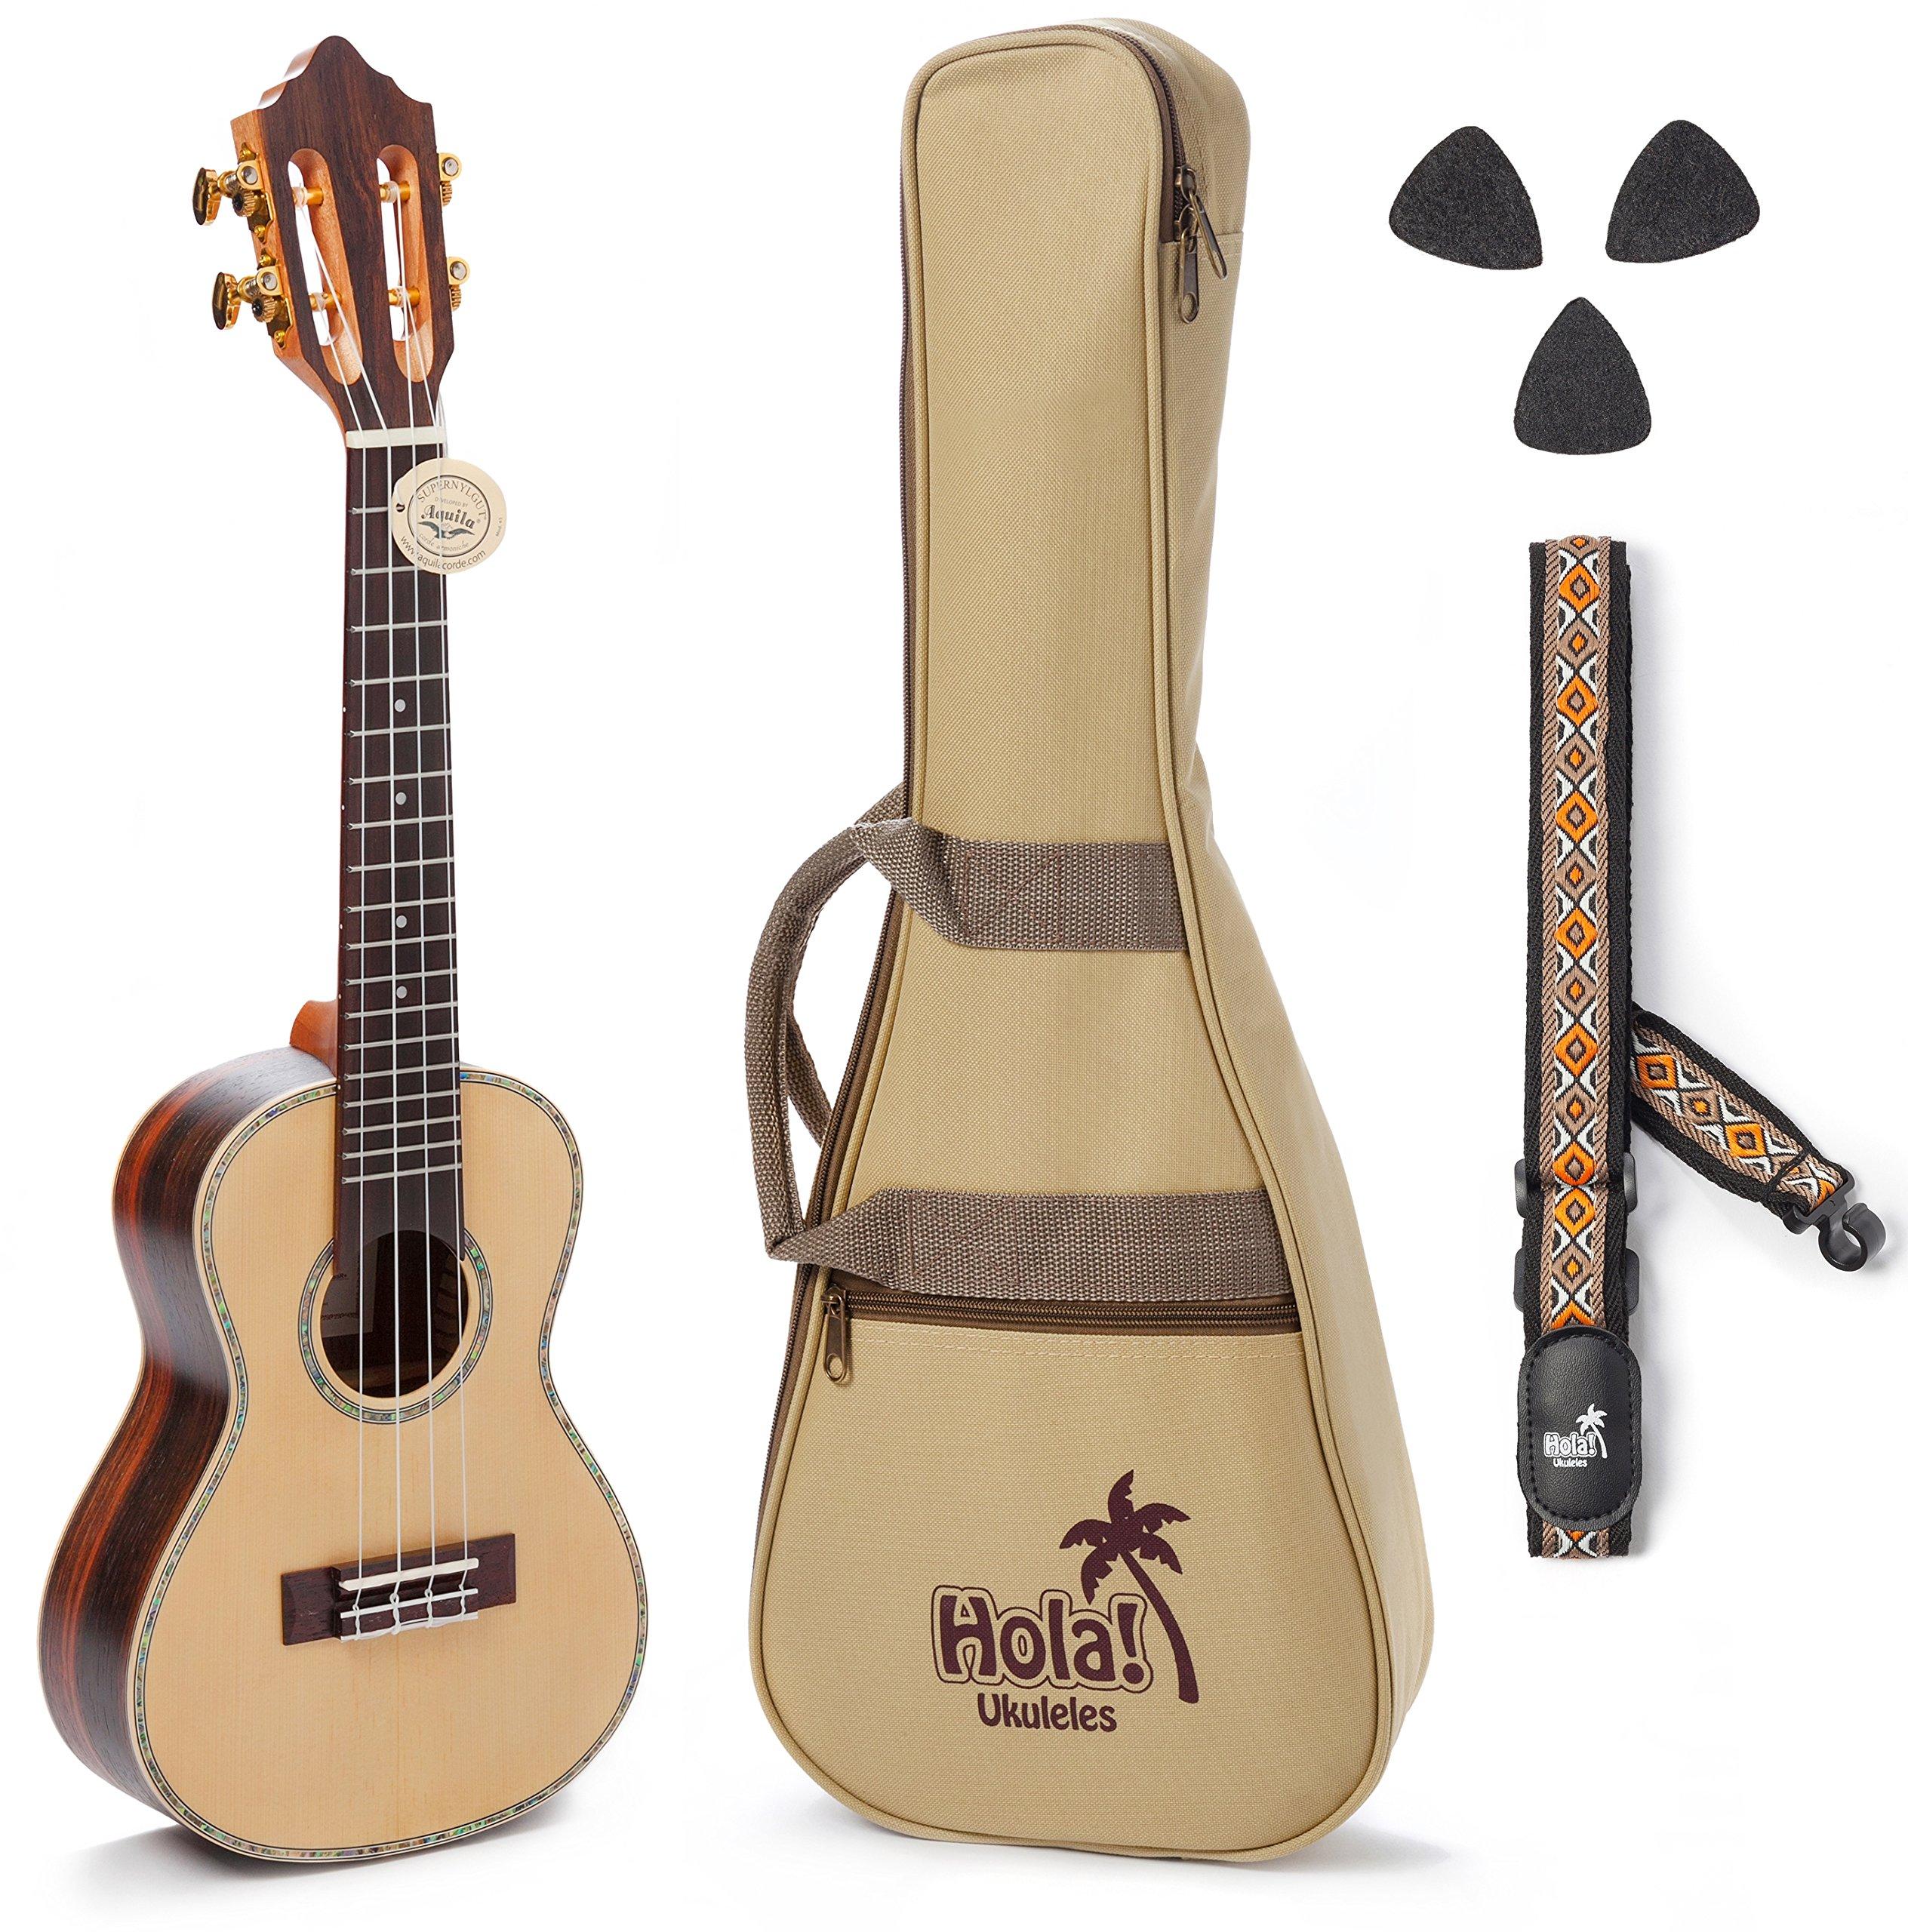 Concert Ukulele Professional Series by Hola! Music (Model HM-424SSR+), Bundle Includes: 24 Inch SOLID Spruce Top Ukulele with Aquila Nylgut Strings Installed, Padded Gig Bag, Strap and Picks